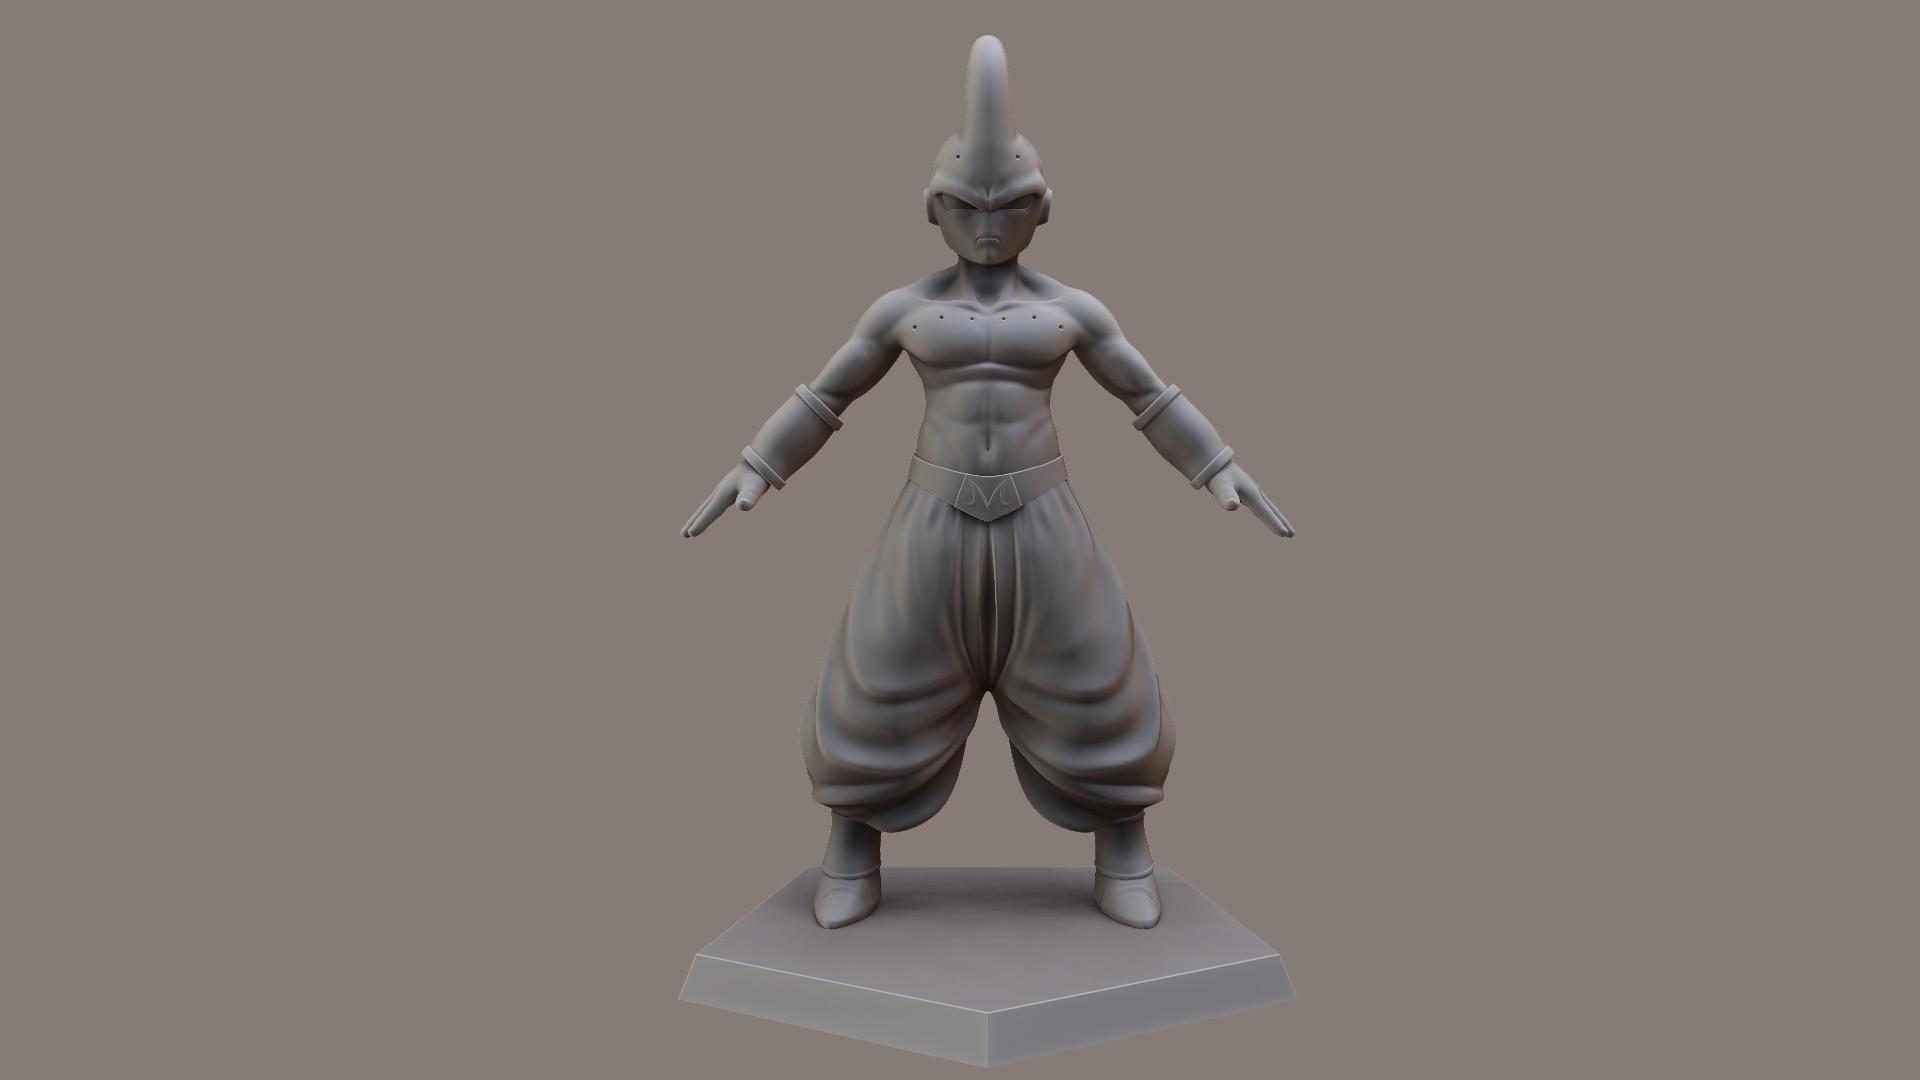 Benjamin makki kid buu sculpt benjamin makki buu render 02 thecheapjerseys Gallery